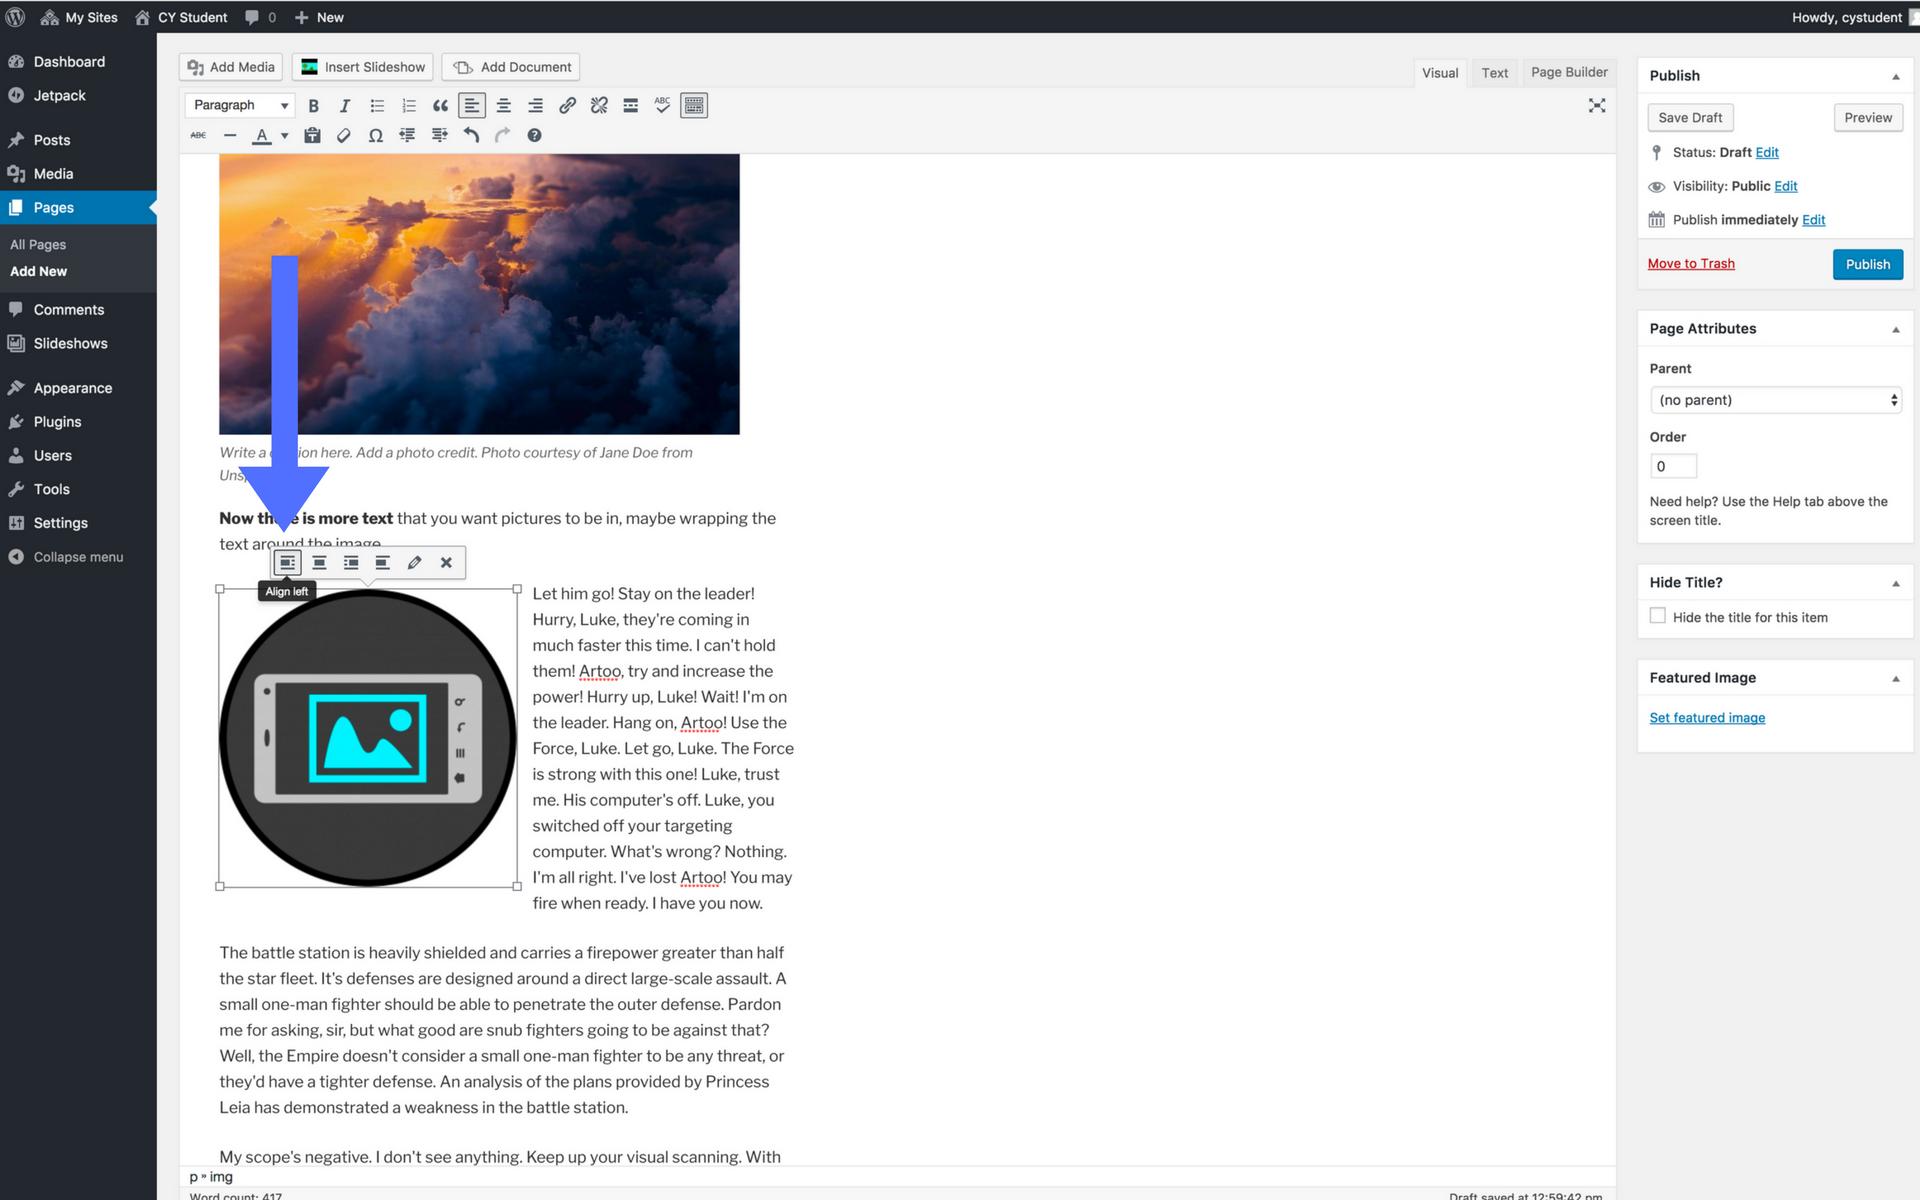 Adding images screenshot step 10